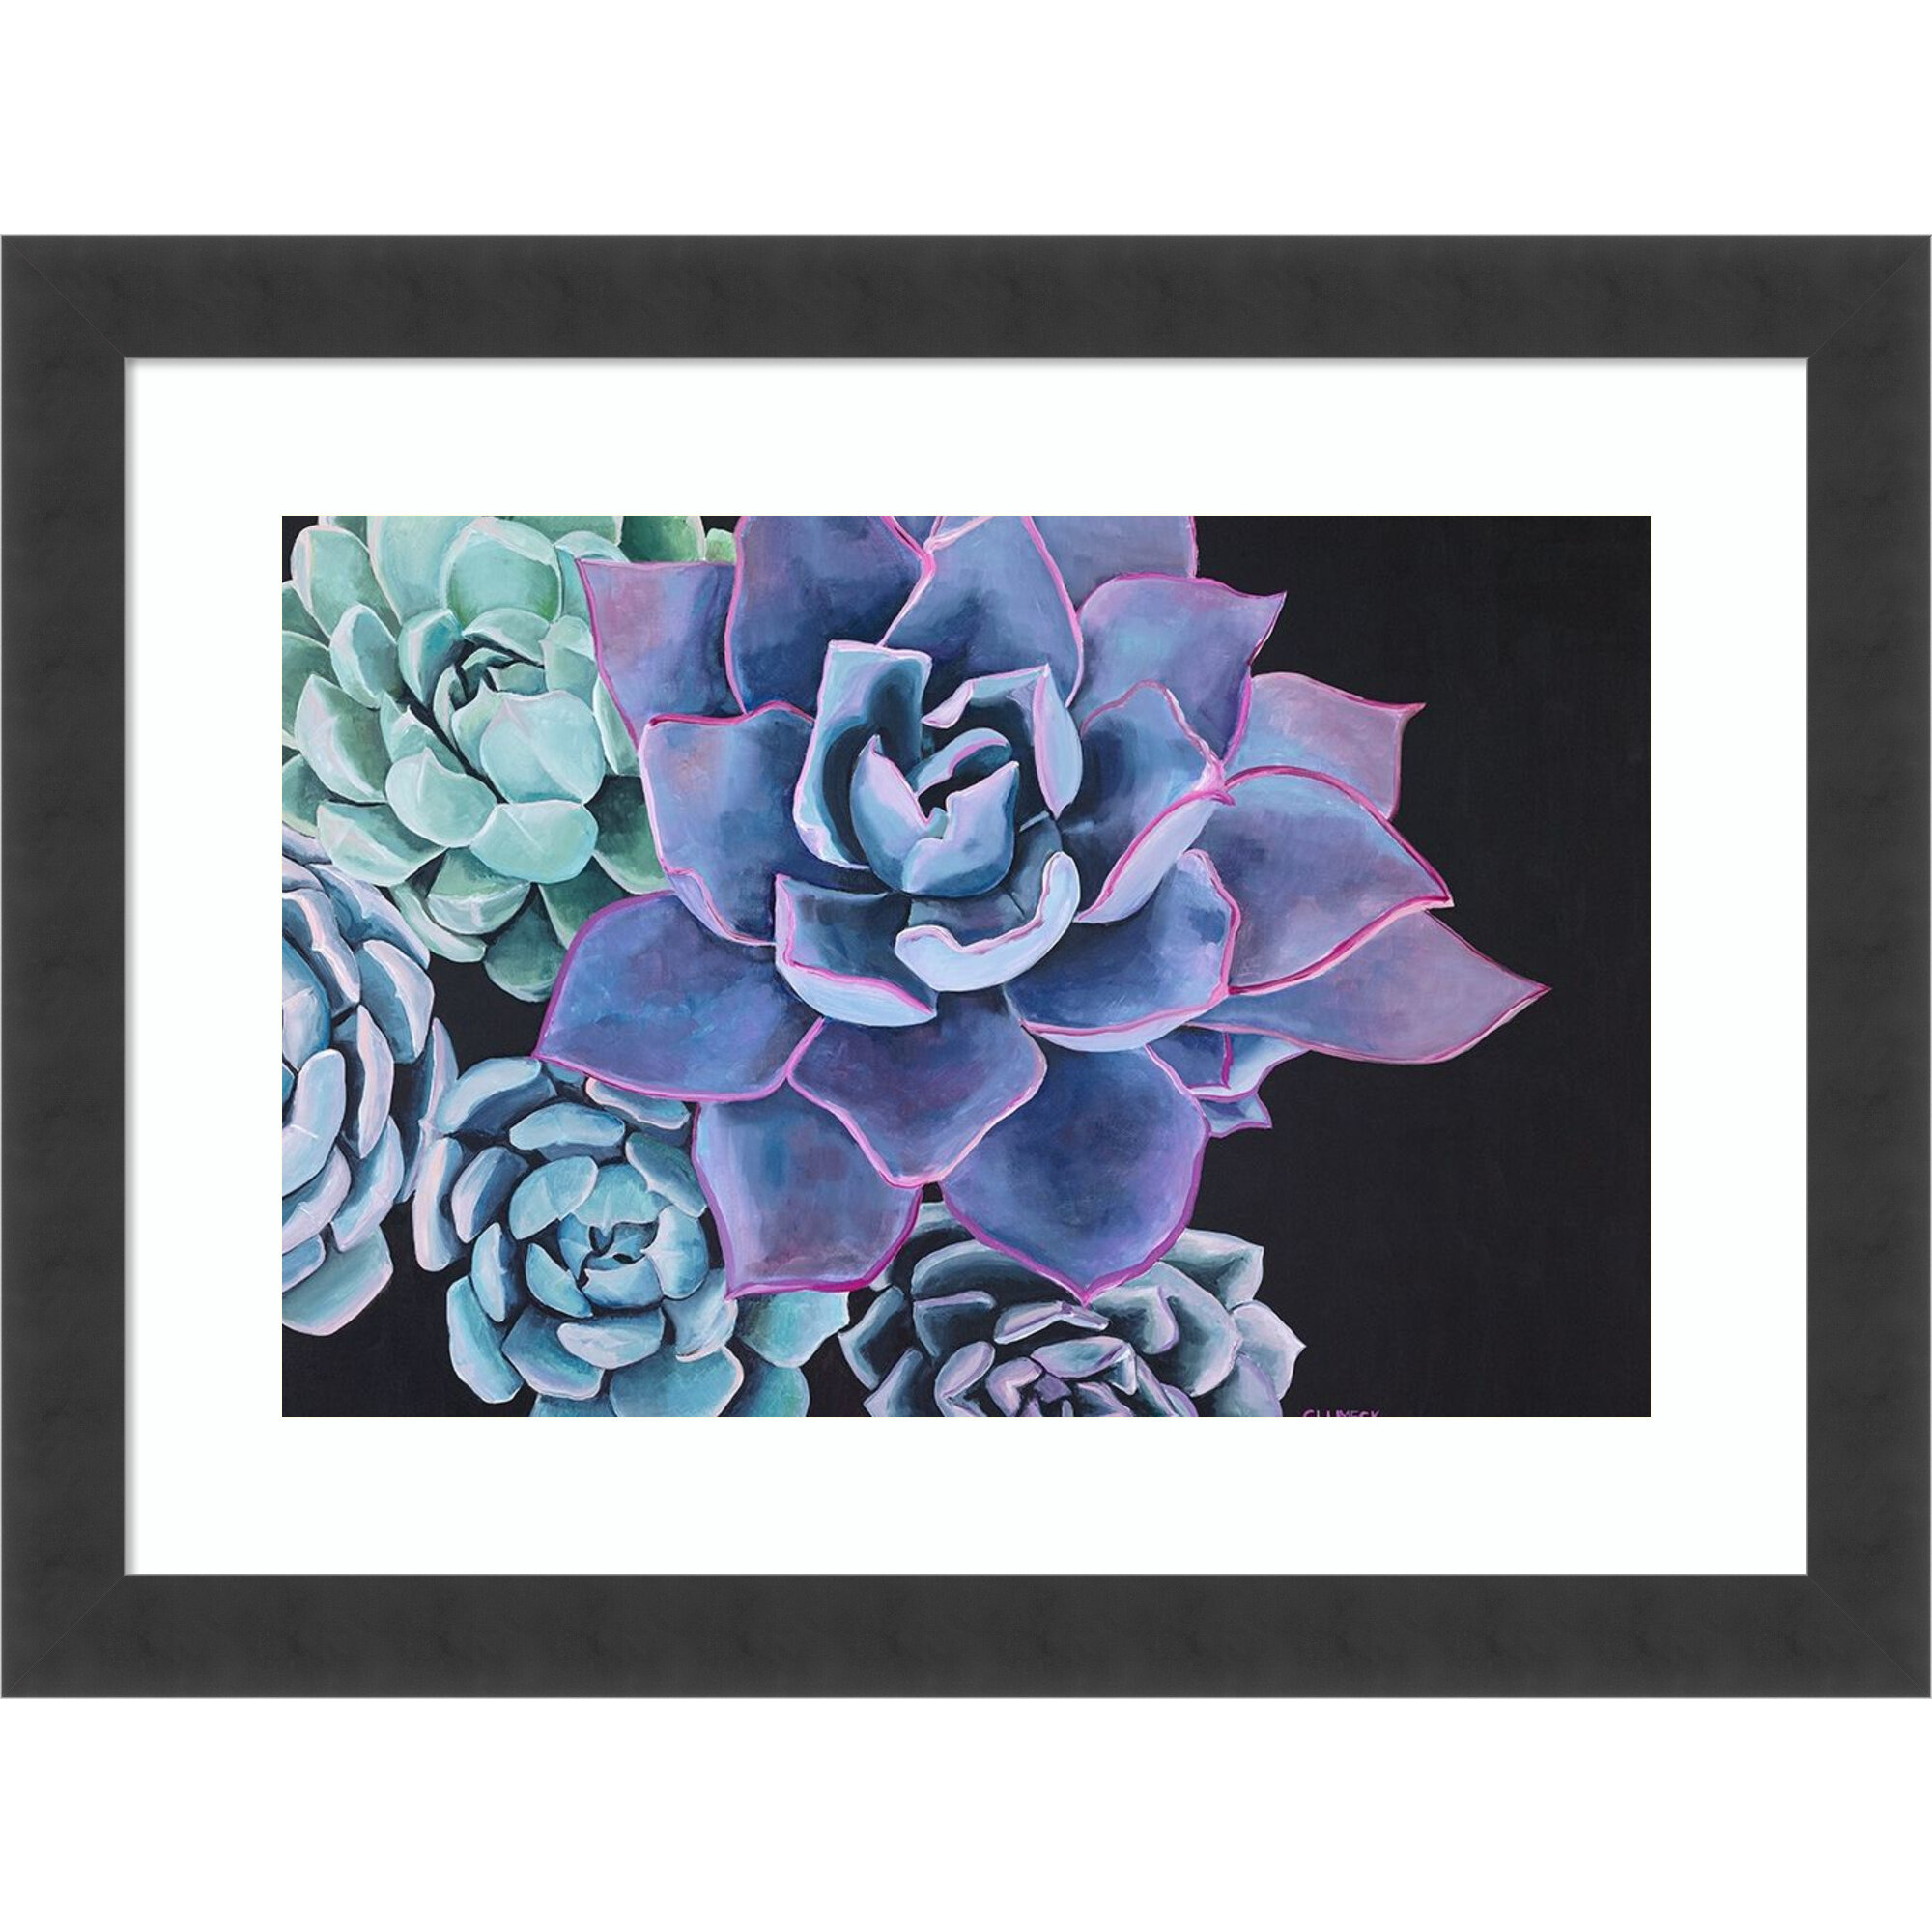 Dakota Fields Abundance Succulent By Alana Clumeck Picture Frame Painting Print On Paper Wayfair